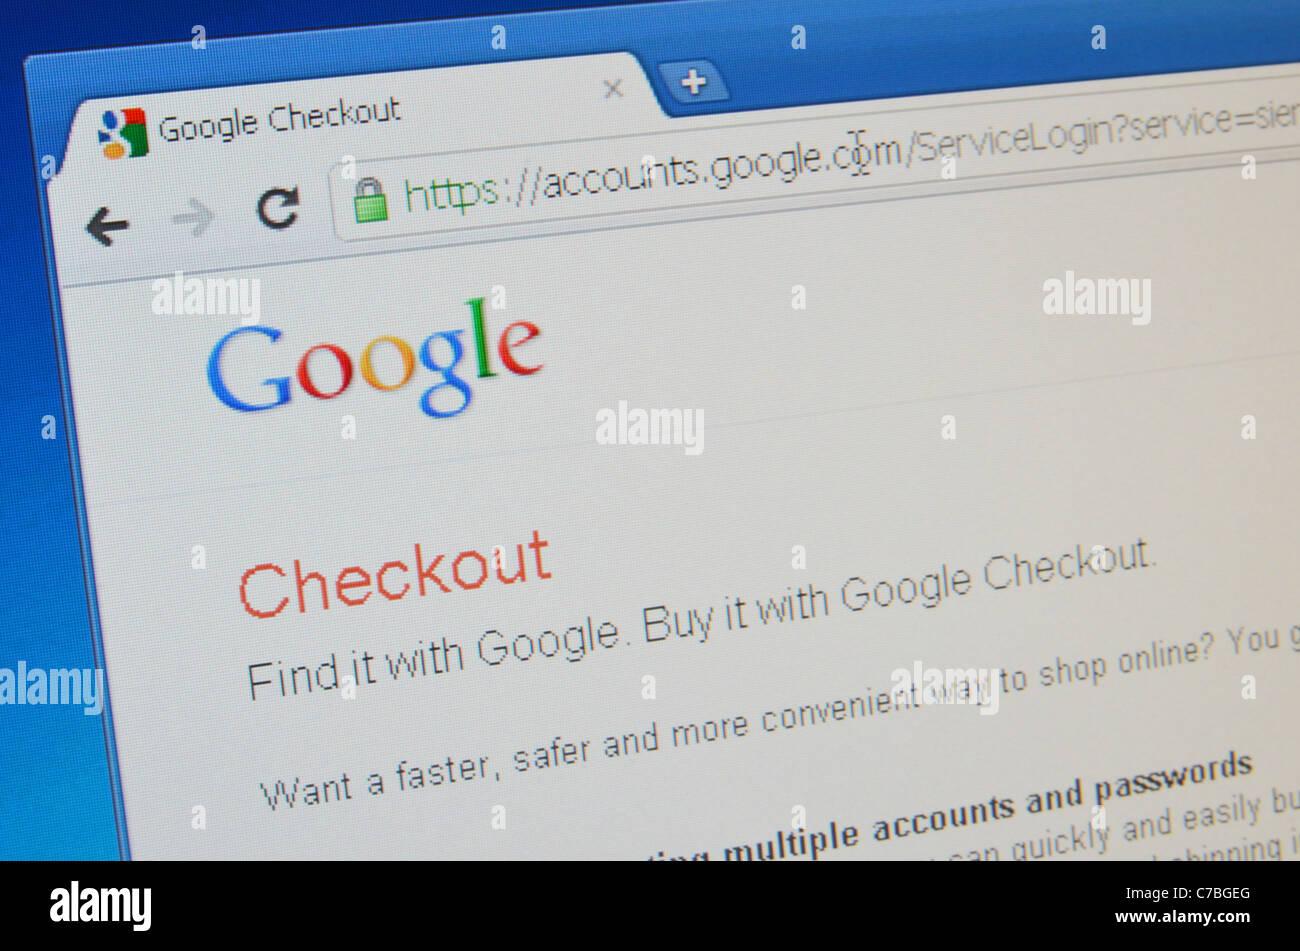 Google Checkout screenshot - Stock Image